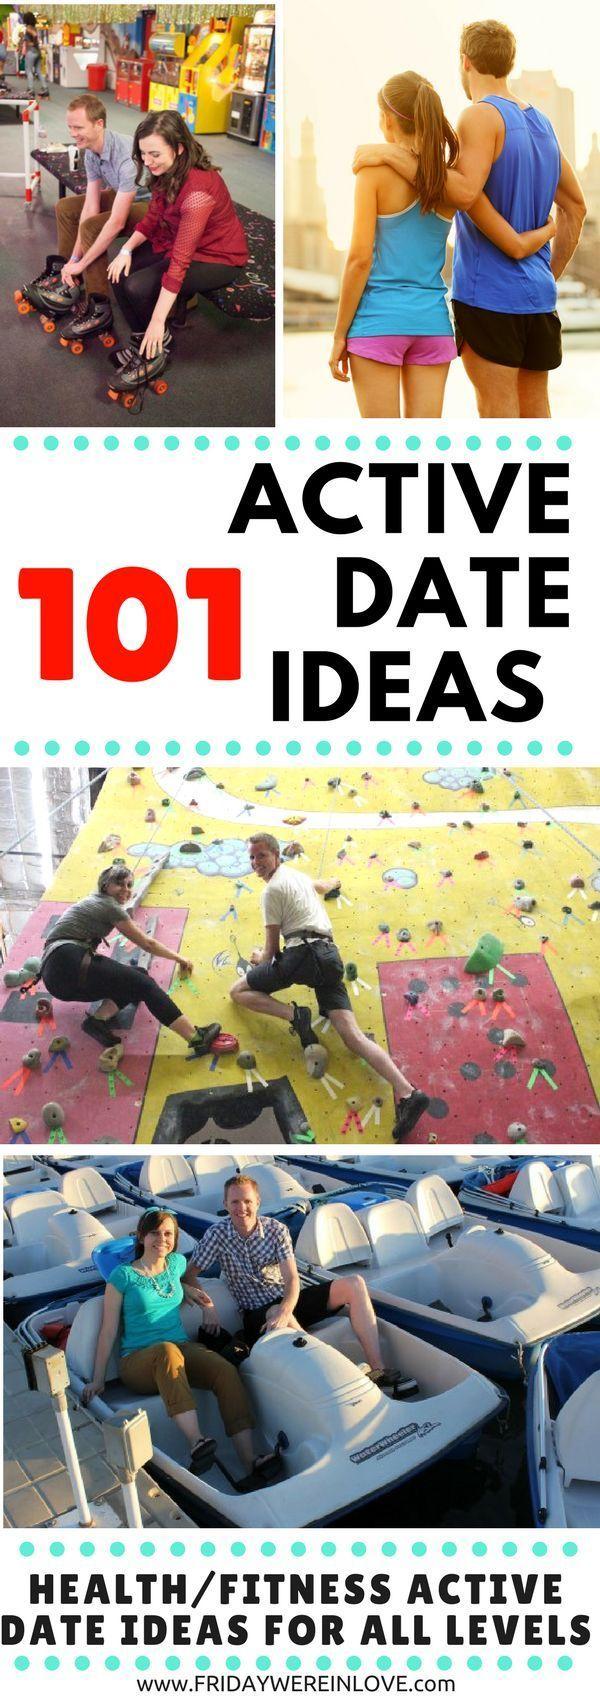 101 Active Date Ideas